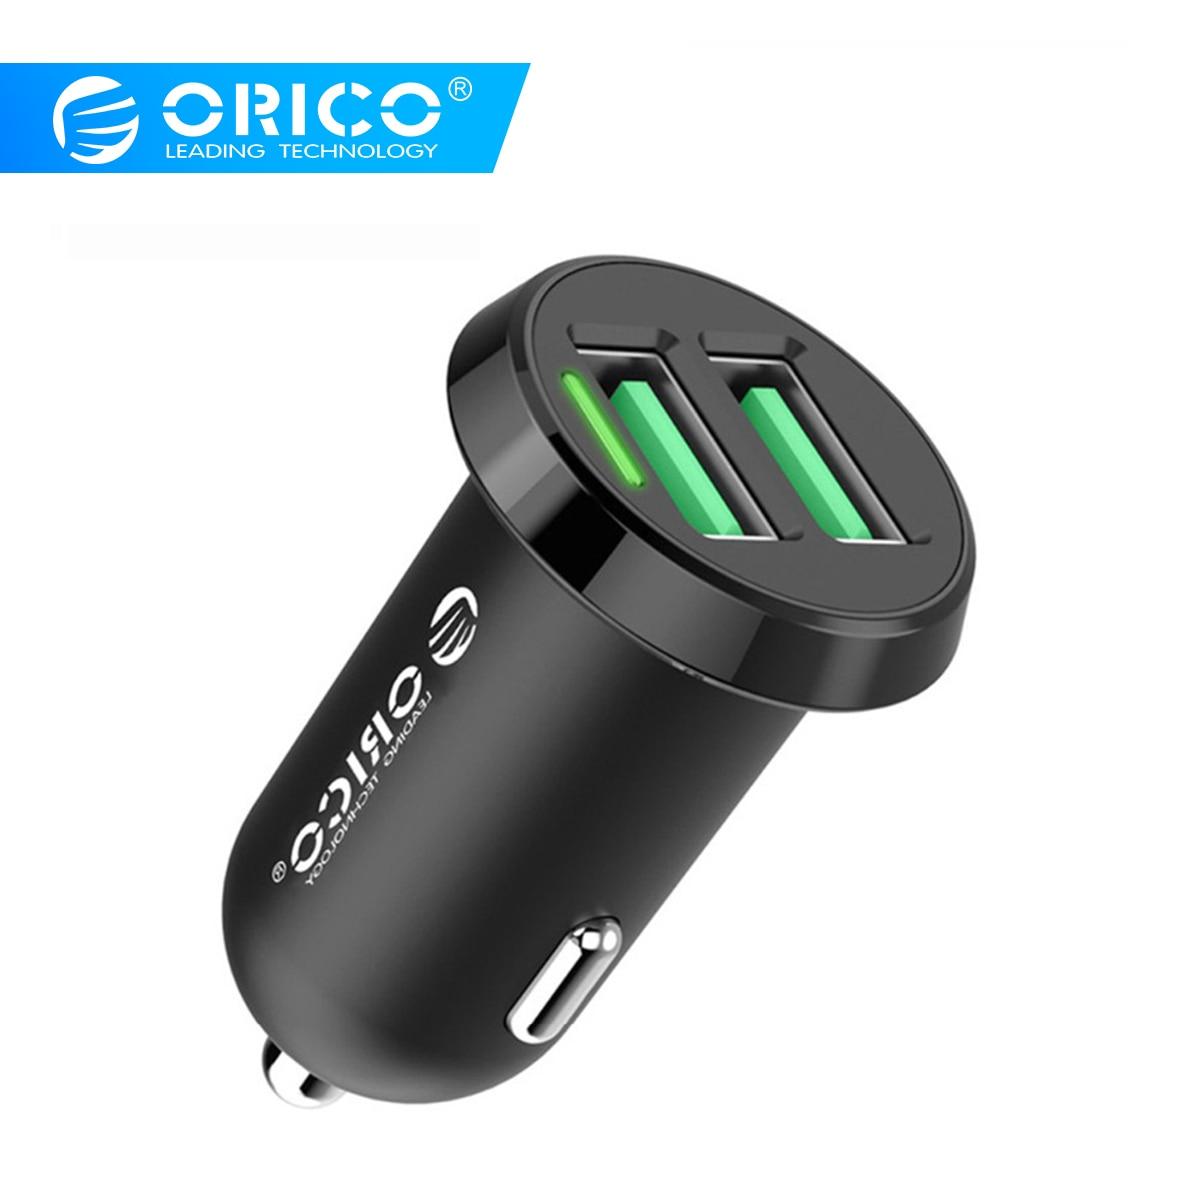 ORICO <b>Dual USB</b> Car Charger 2.4A Intelligent Output 17W Travel ...